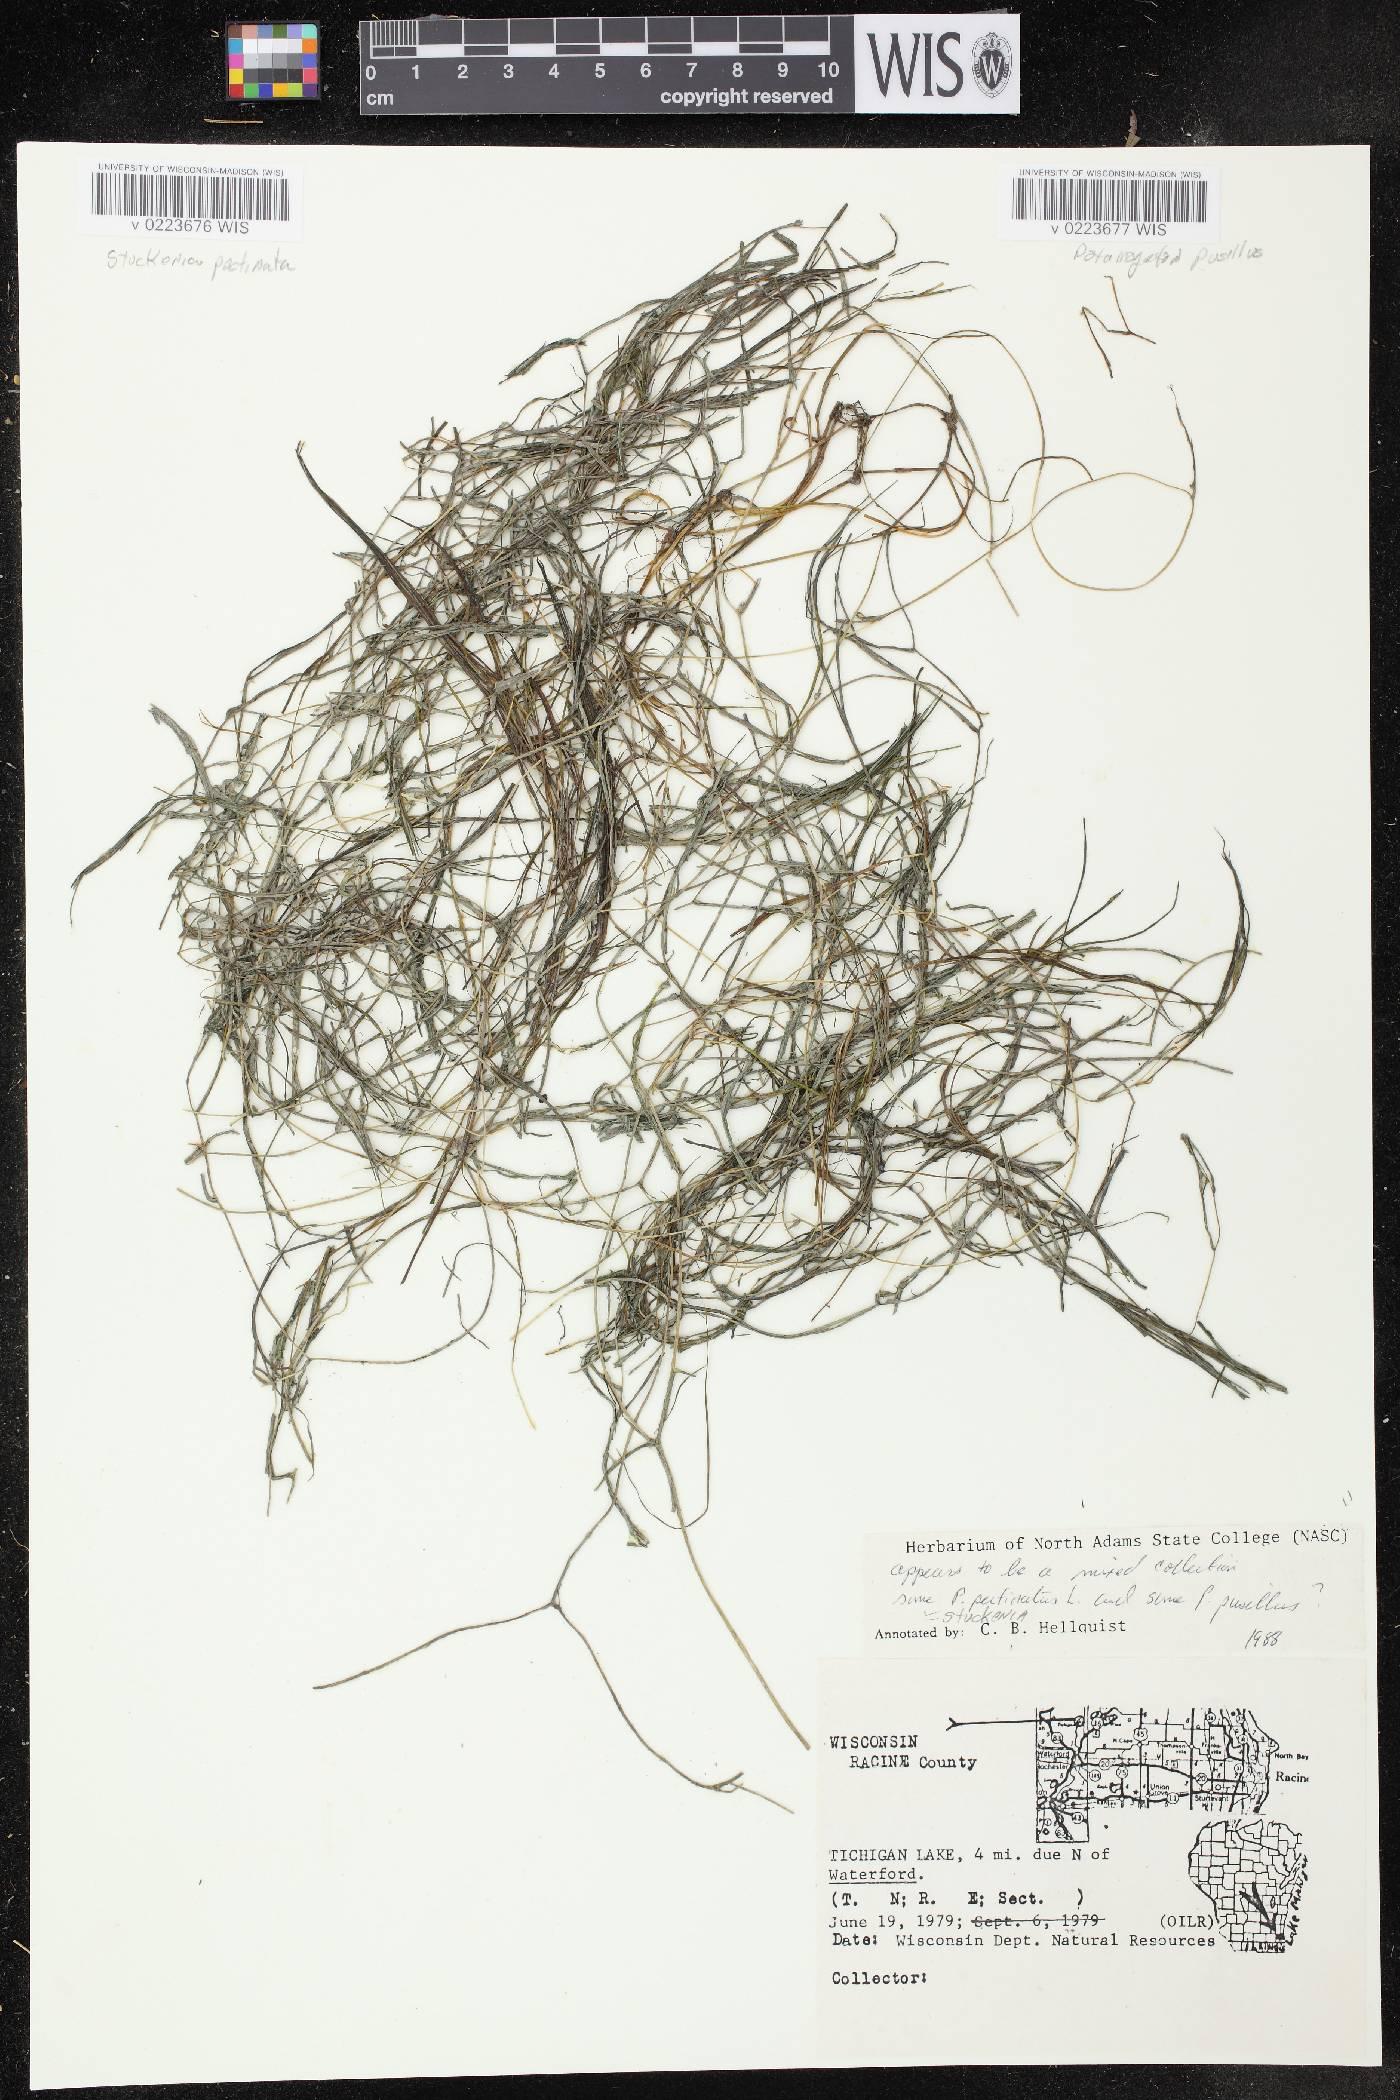 Stuckenia pectinata image